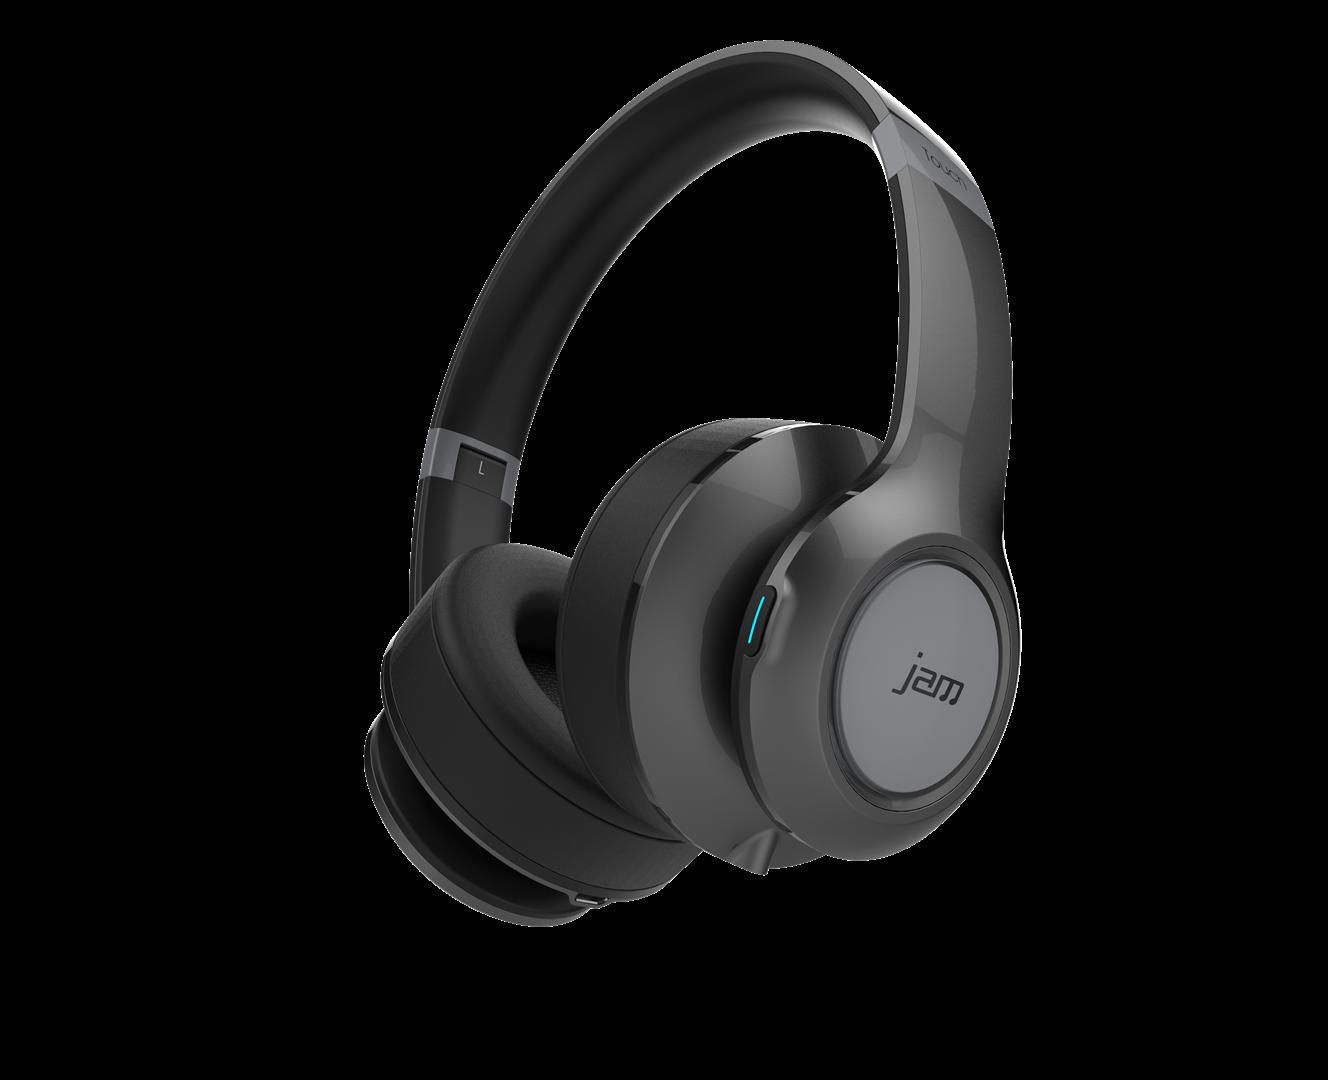 hmdx jam bluetooth wireless speaker driver windows 7. Black Bedroom Furniture Sets. Home Design Ideas